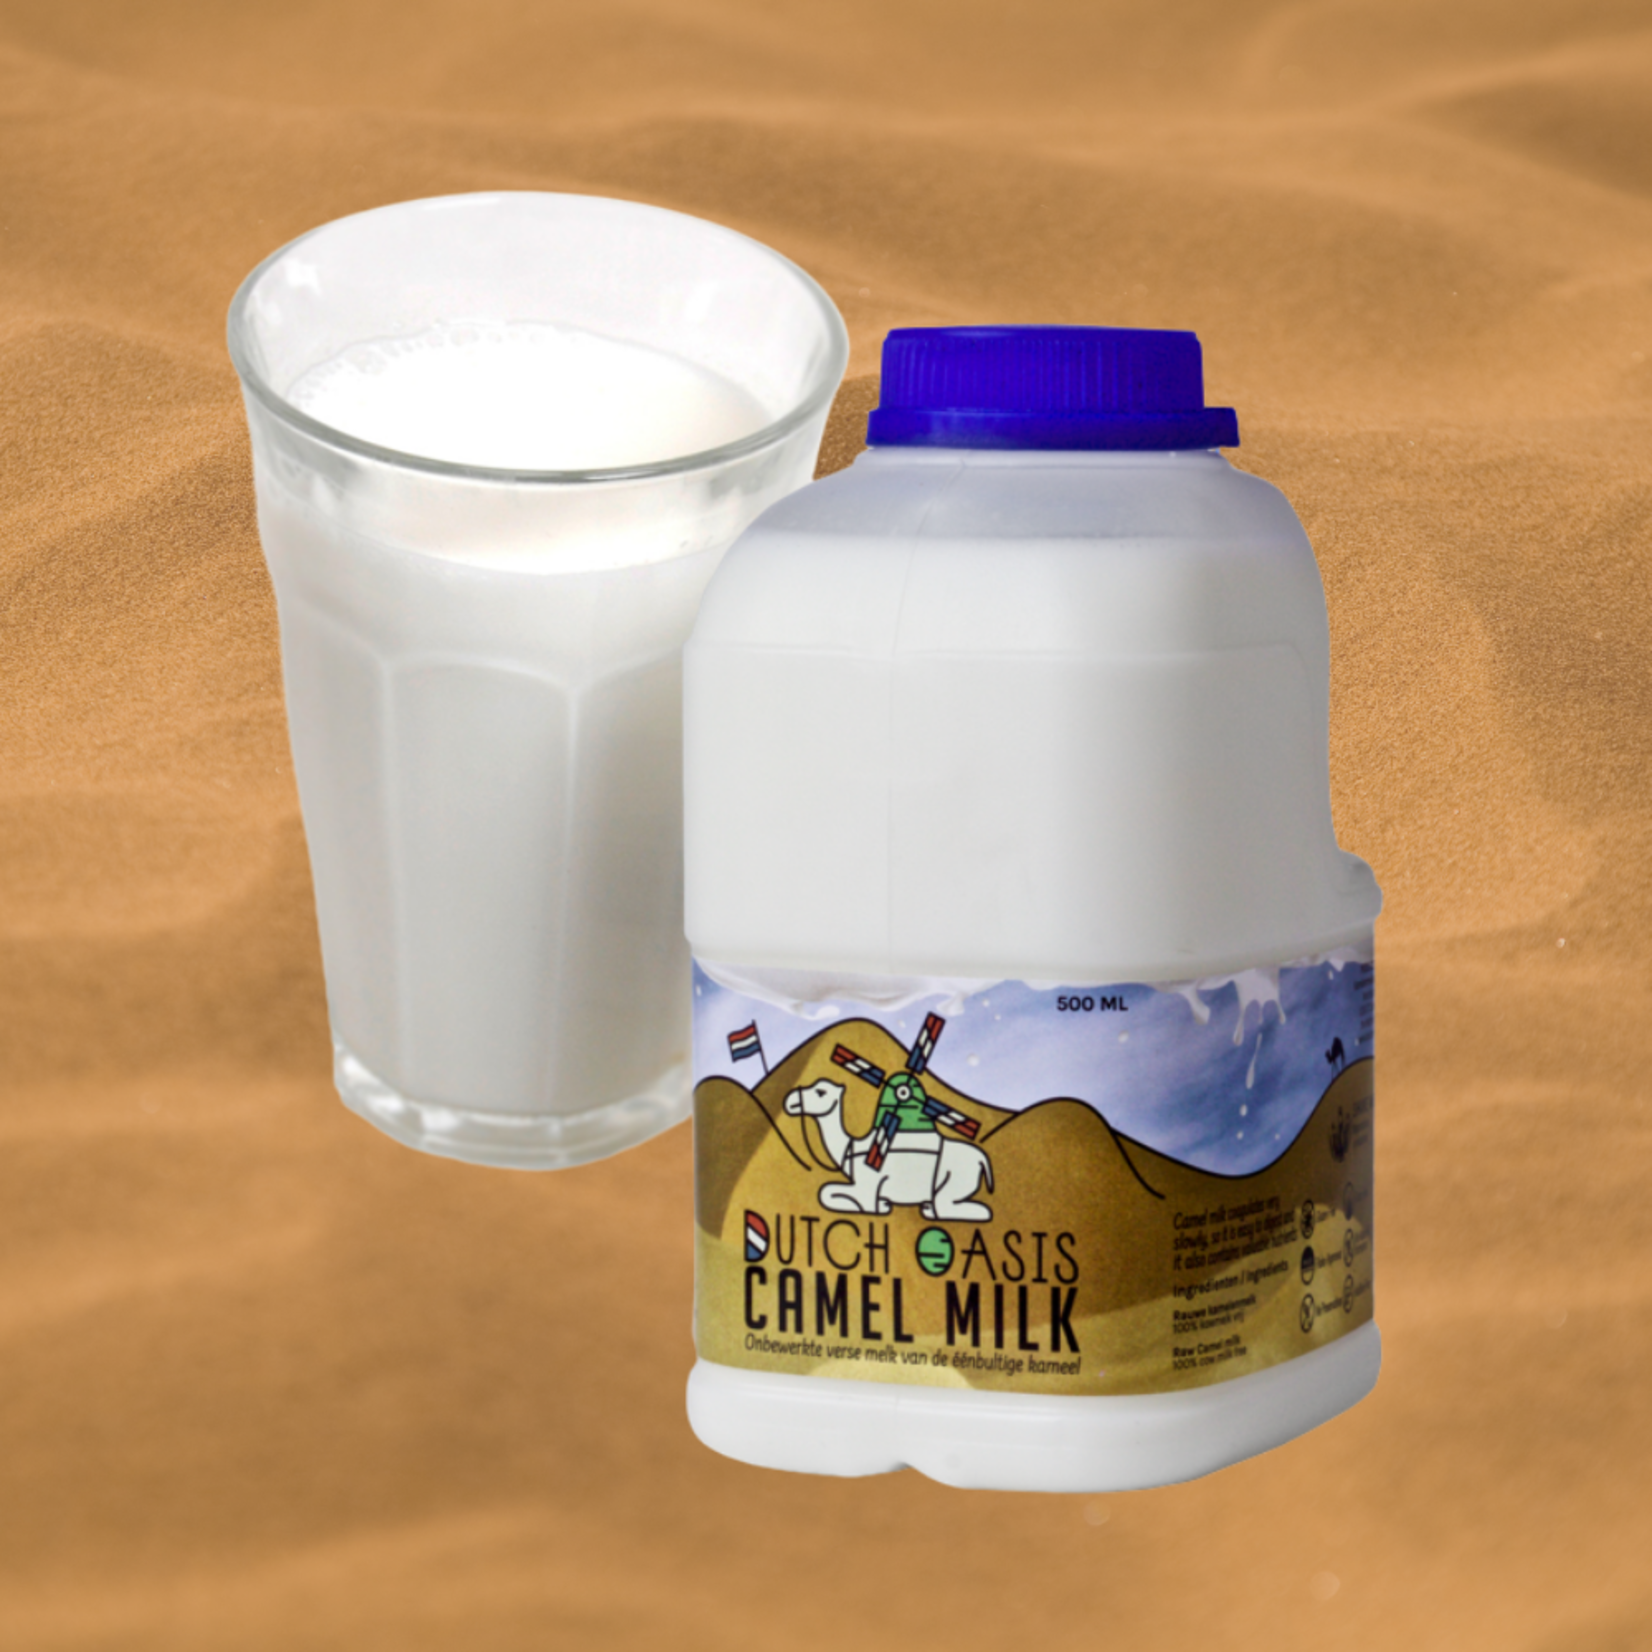 Dutch Oasis 14 bottles (á 500ml) Fresh and raw camel milk